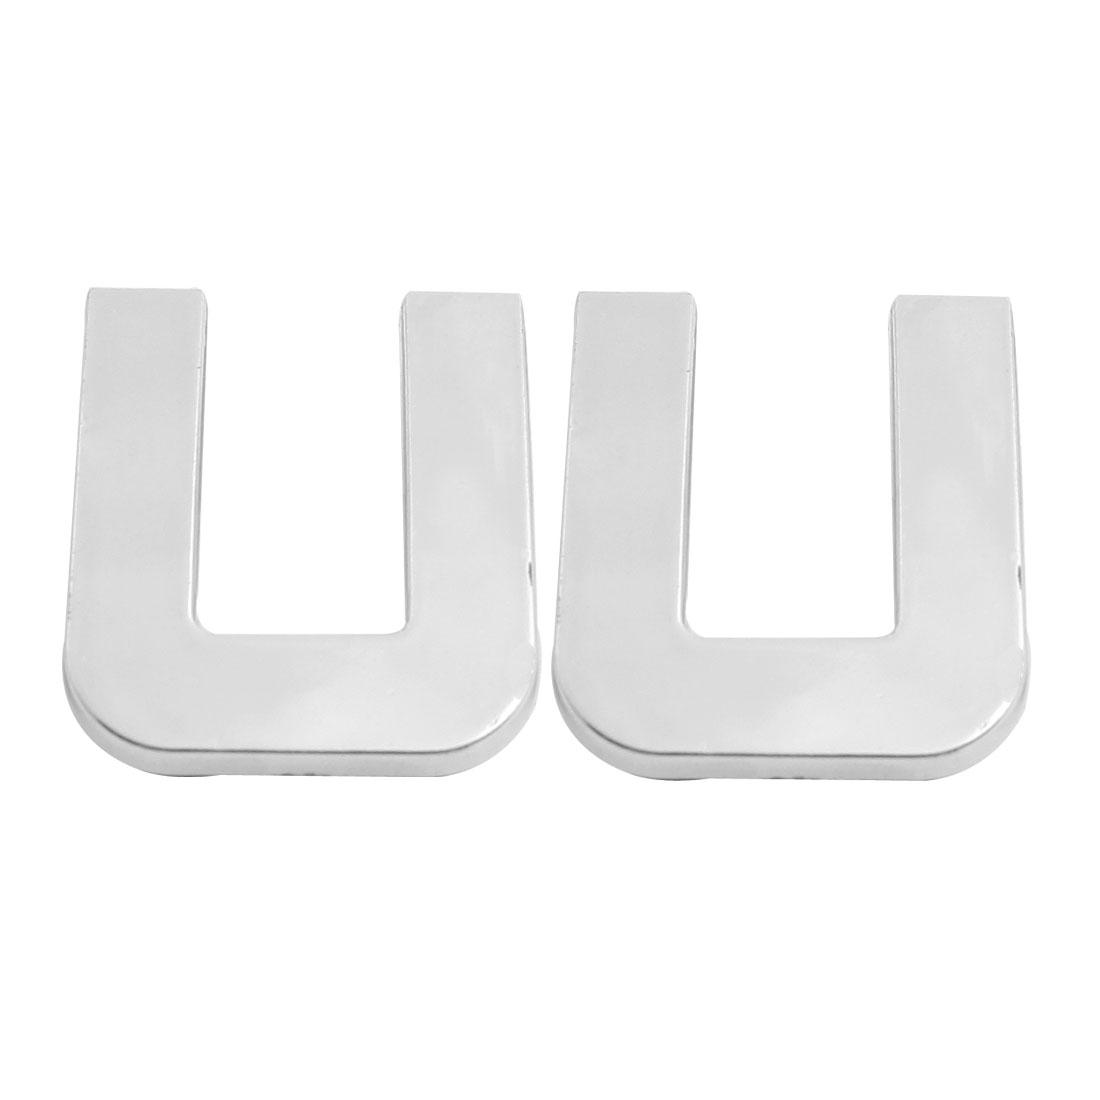 Motorcycle Car U Letter 3D Emblem Badge Sticker Decor Silver Tone 2 Pcs